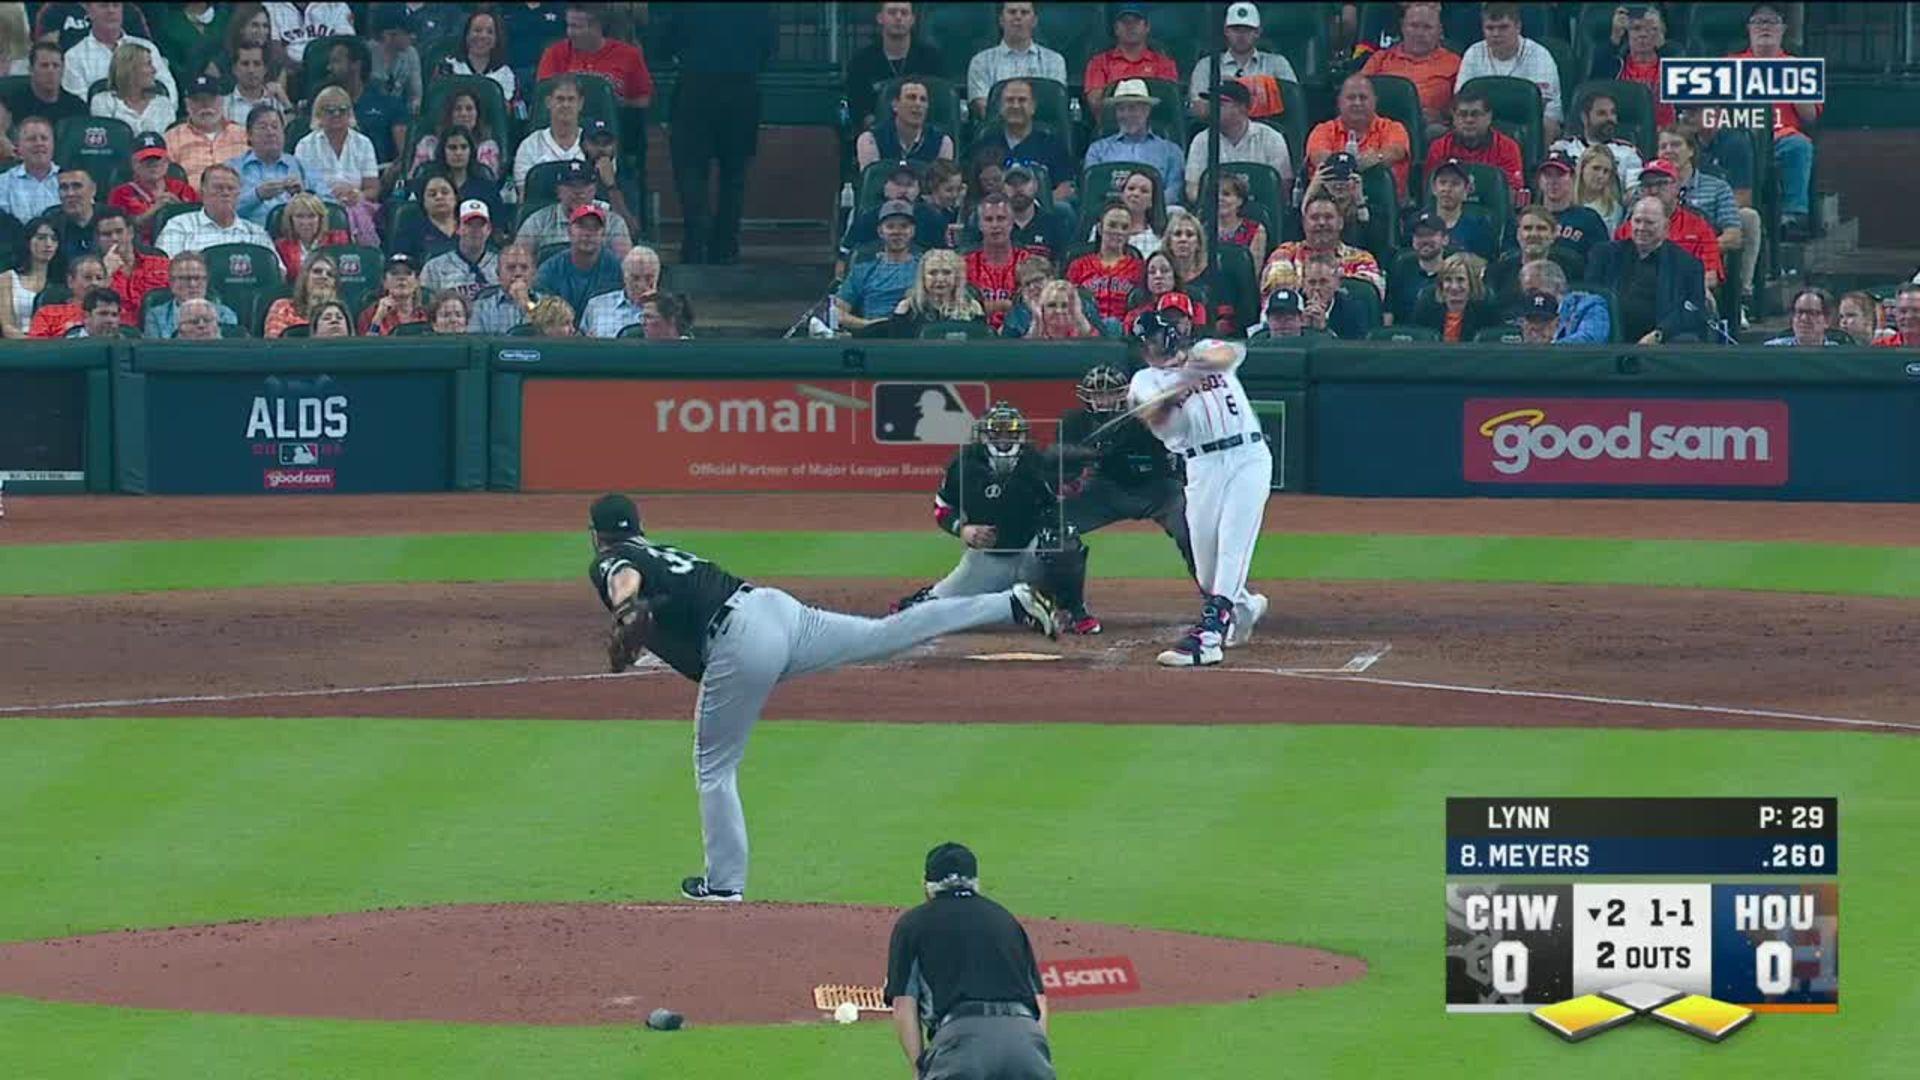 WATCH: Yordan bringing boom for hot Astros thumbnail